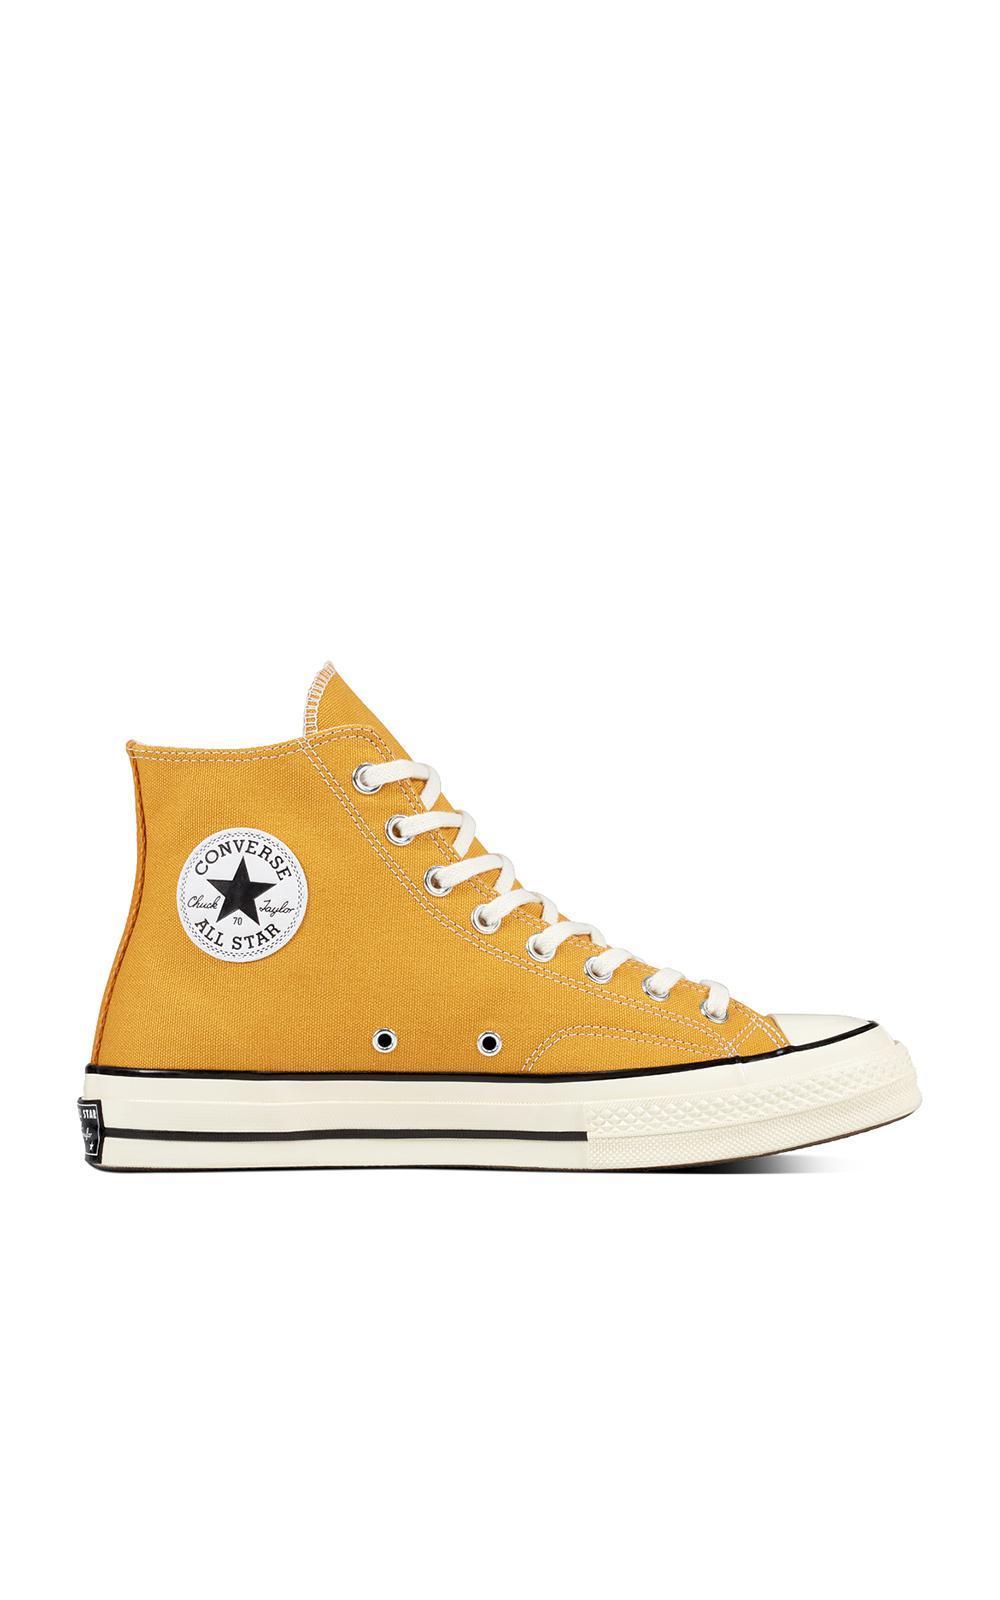 4355fbf331eb Converse All Star Chuck 70 Hi Sunflower for Men - Lyst